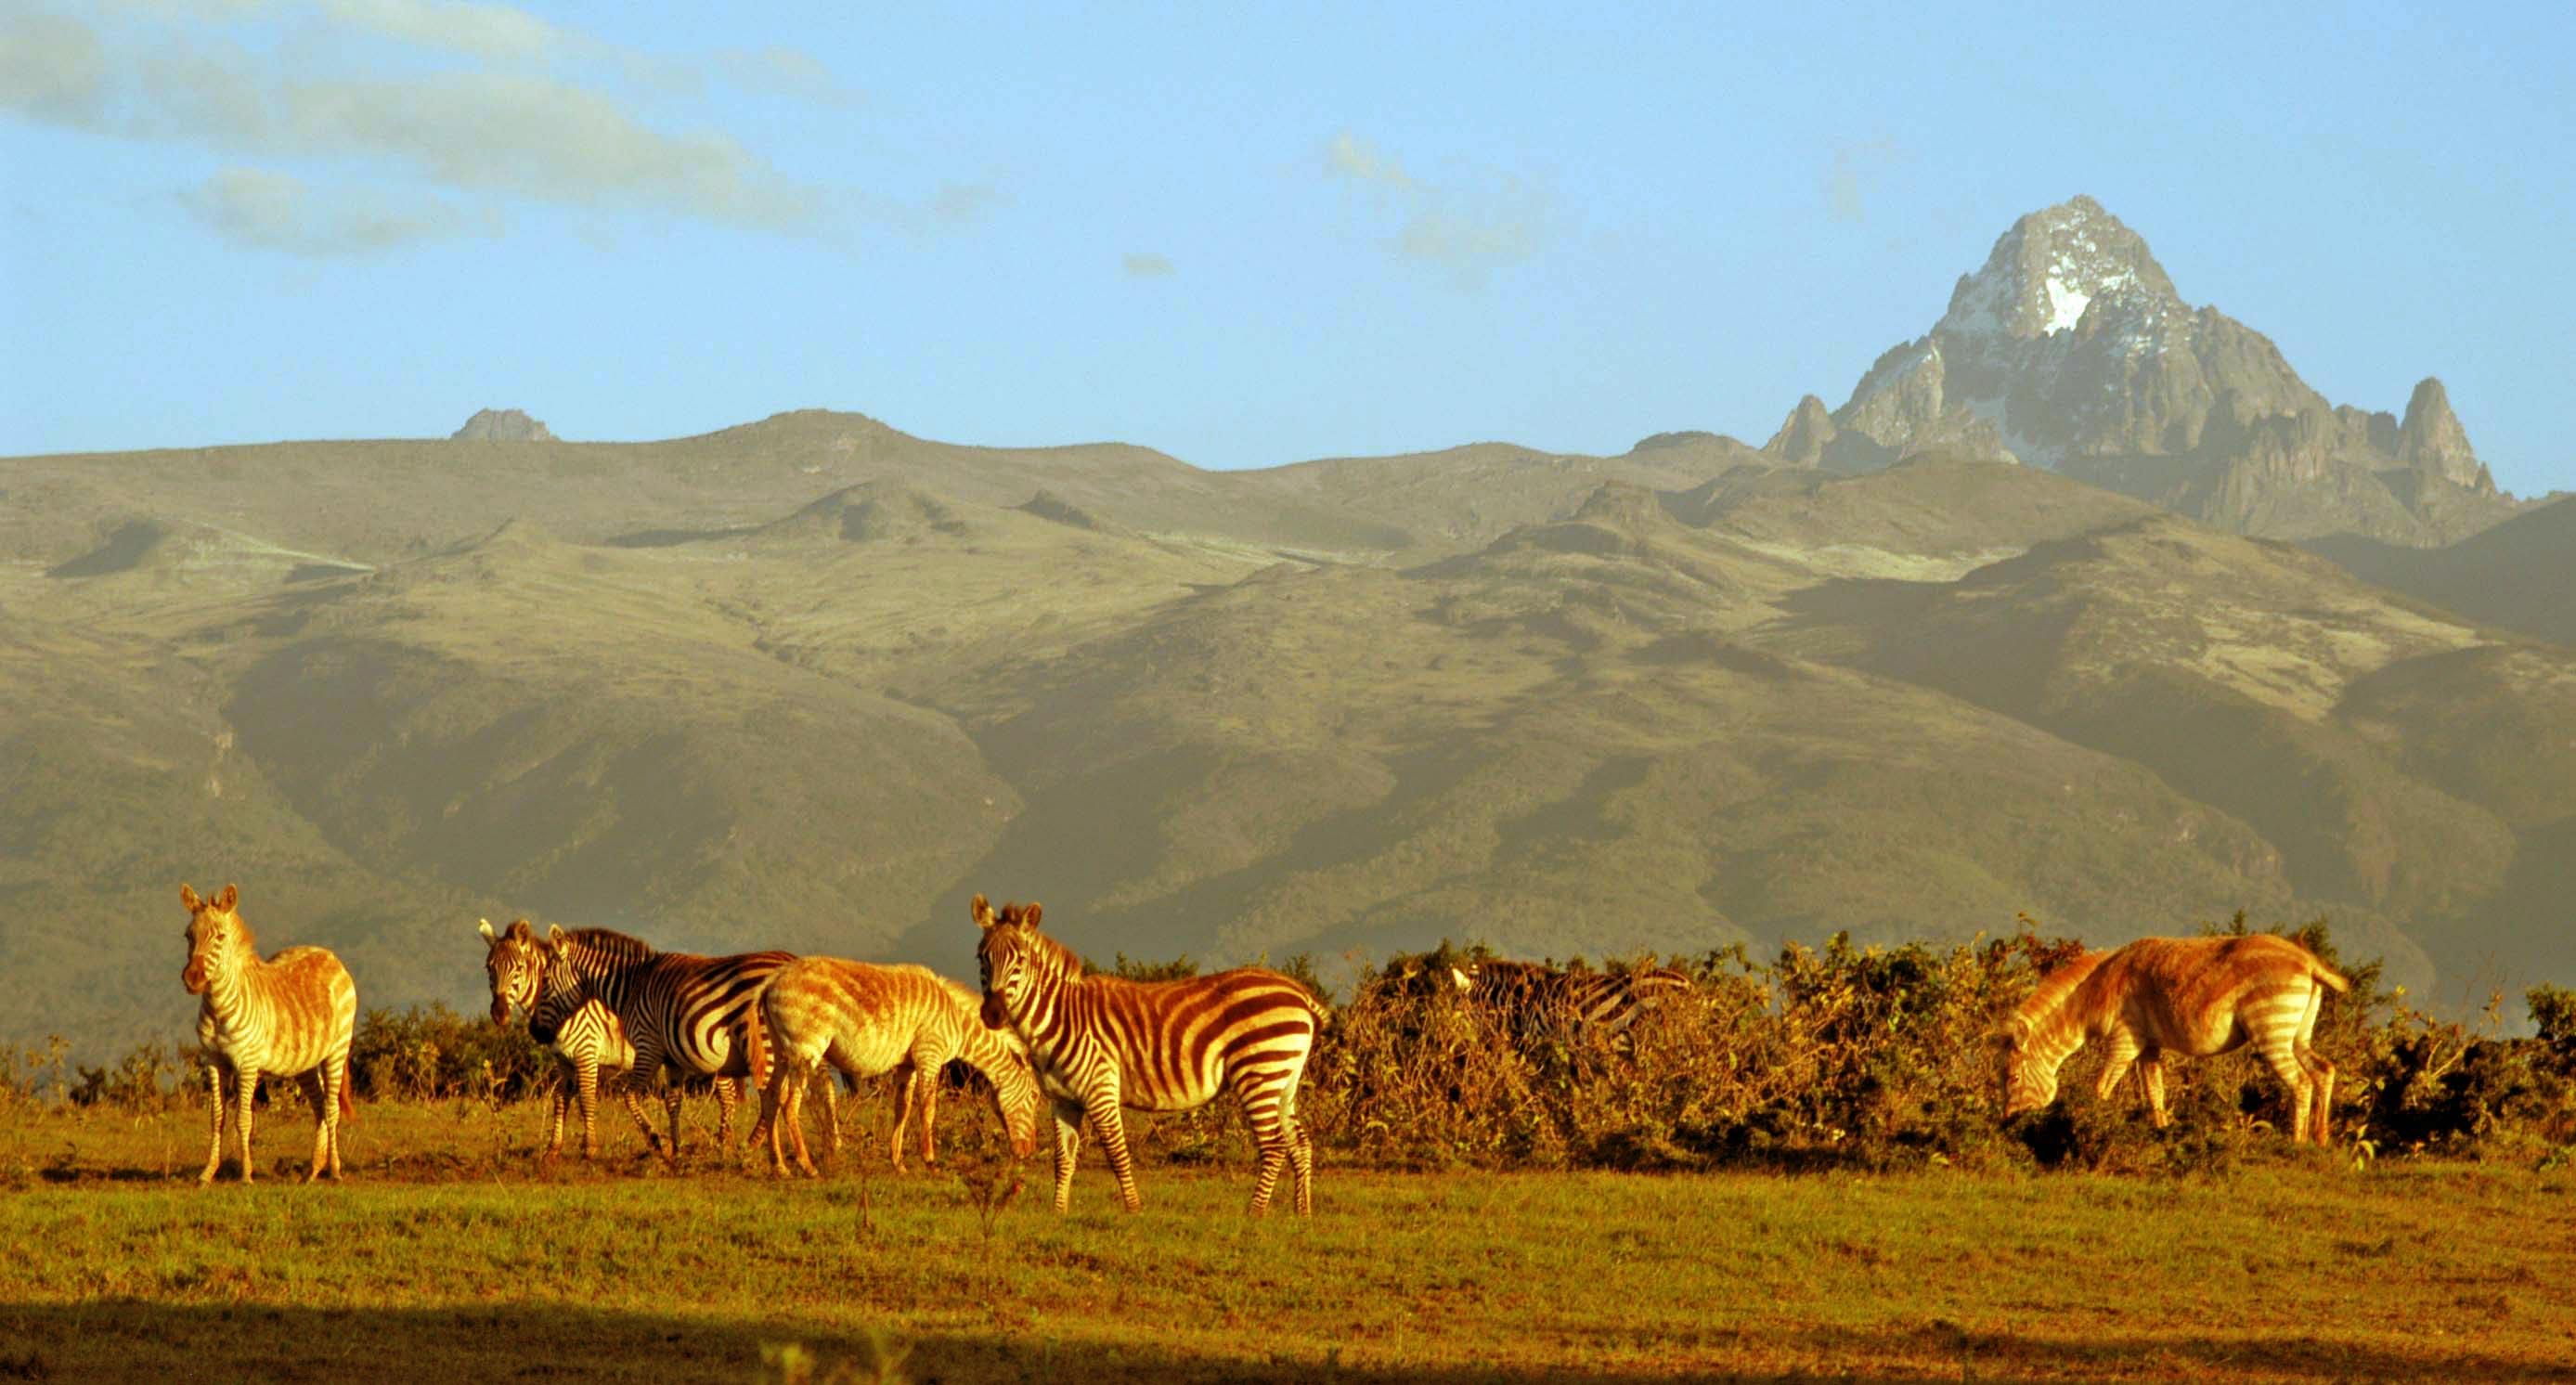 sejour-safari-et-plongee-au-kenya